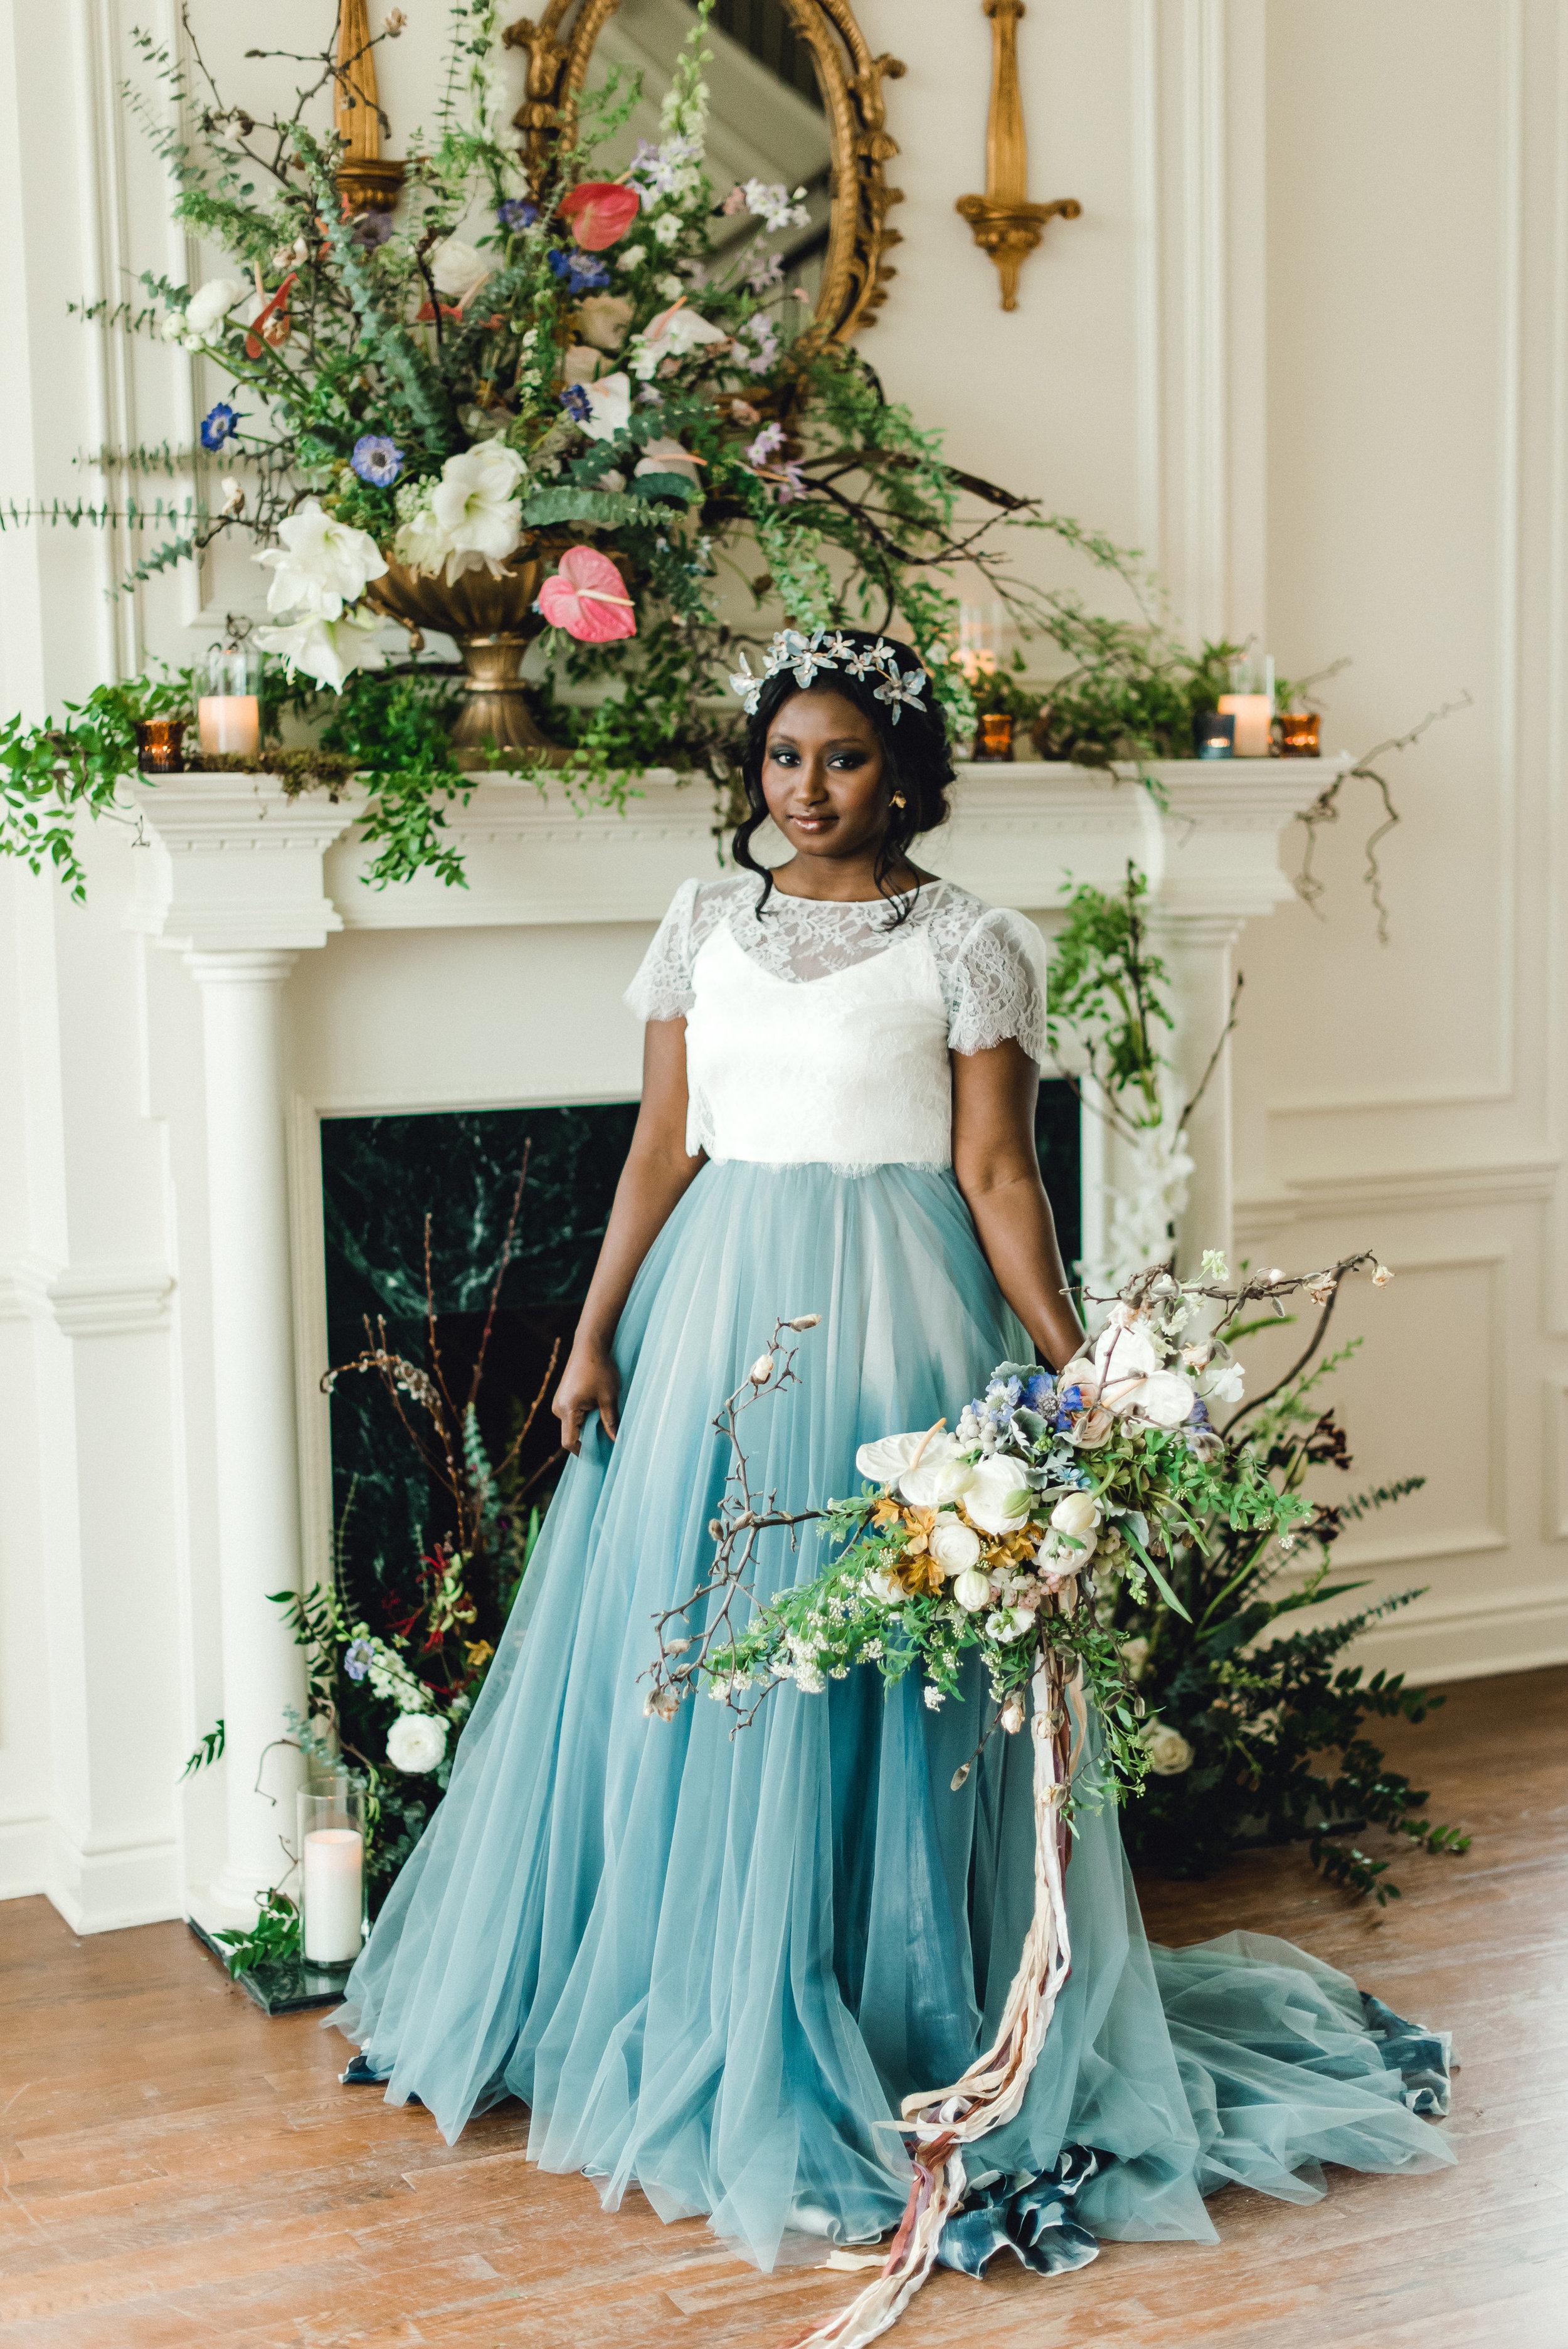 Pittsburgh-Moody-Wedding-Bouquet.jpg